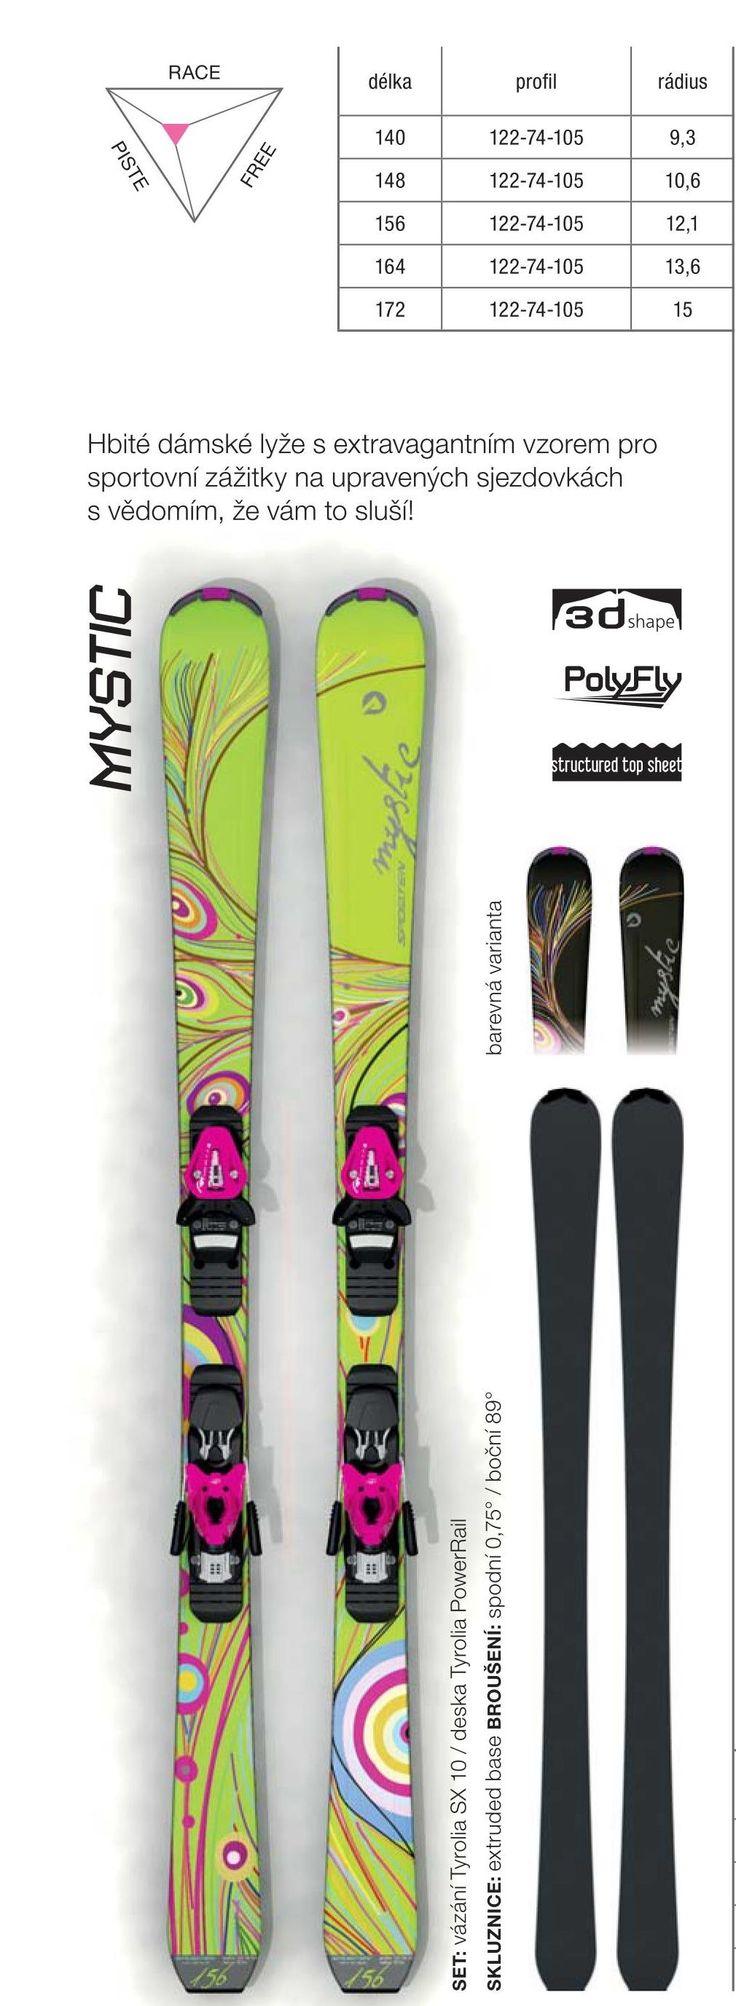 Women design - Sporten Mystic skis 2015/16 collection